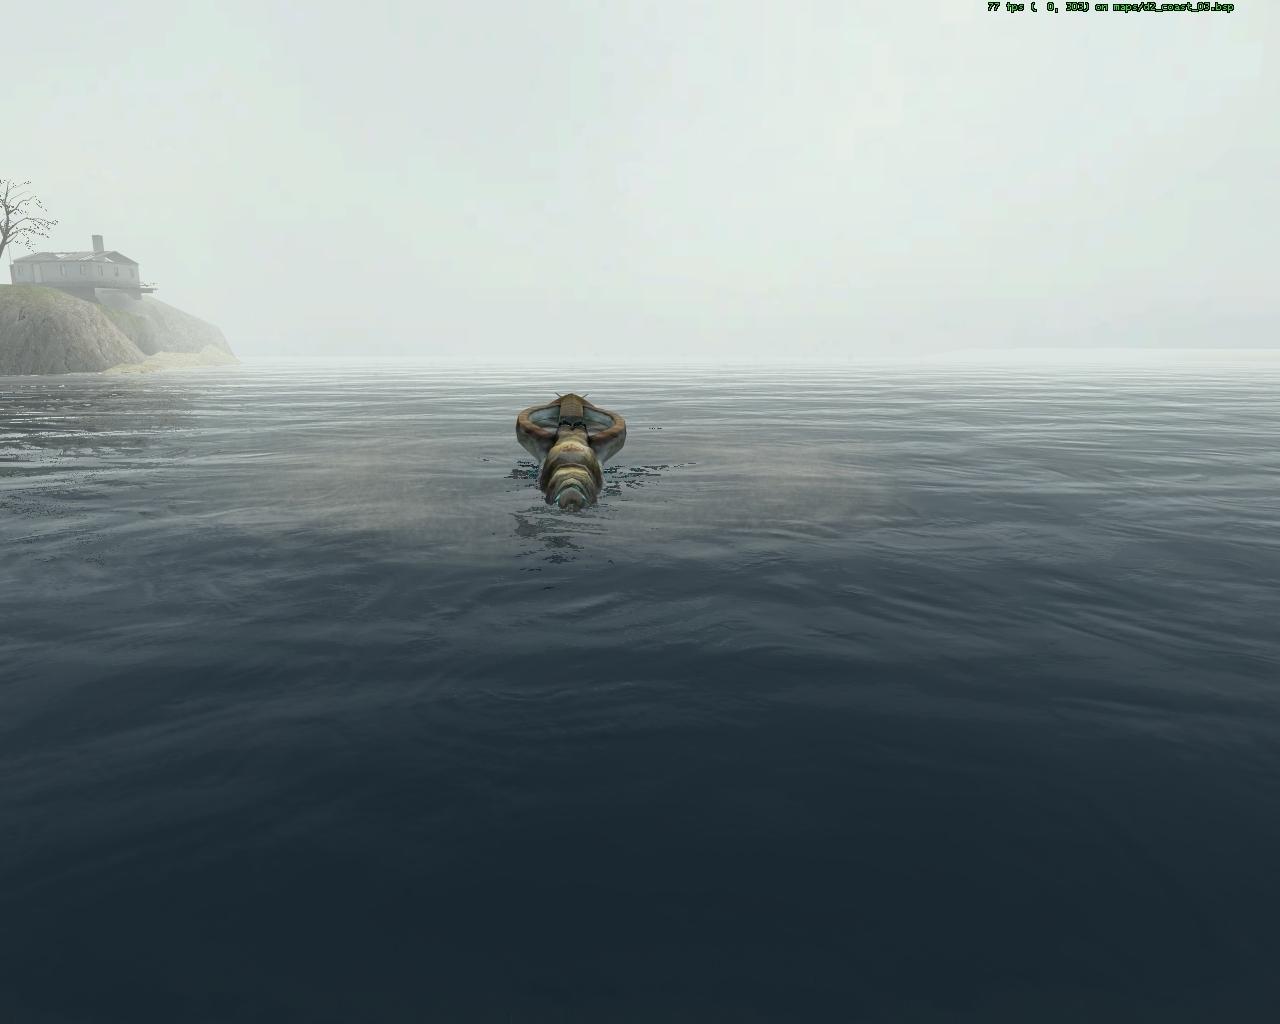 d2_coast_030014.jpg - Half-Life 2